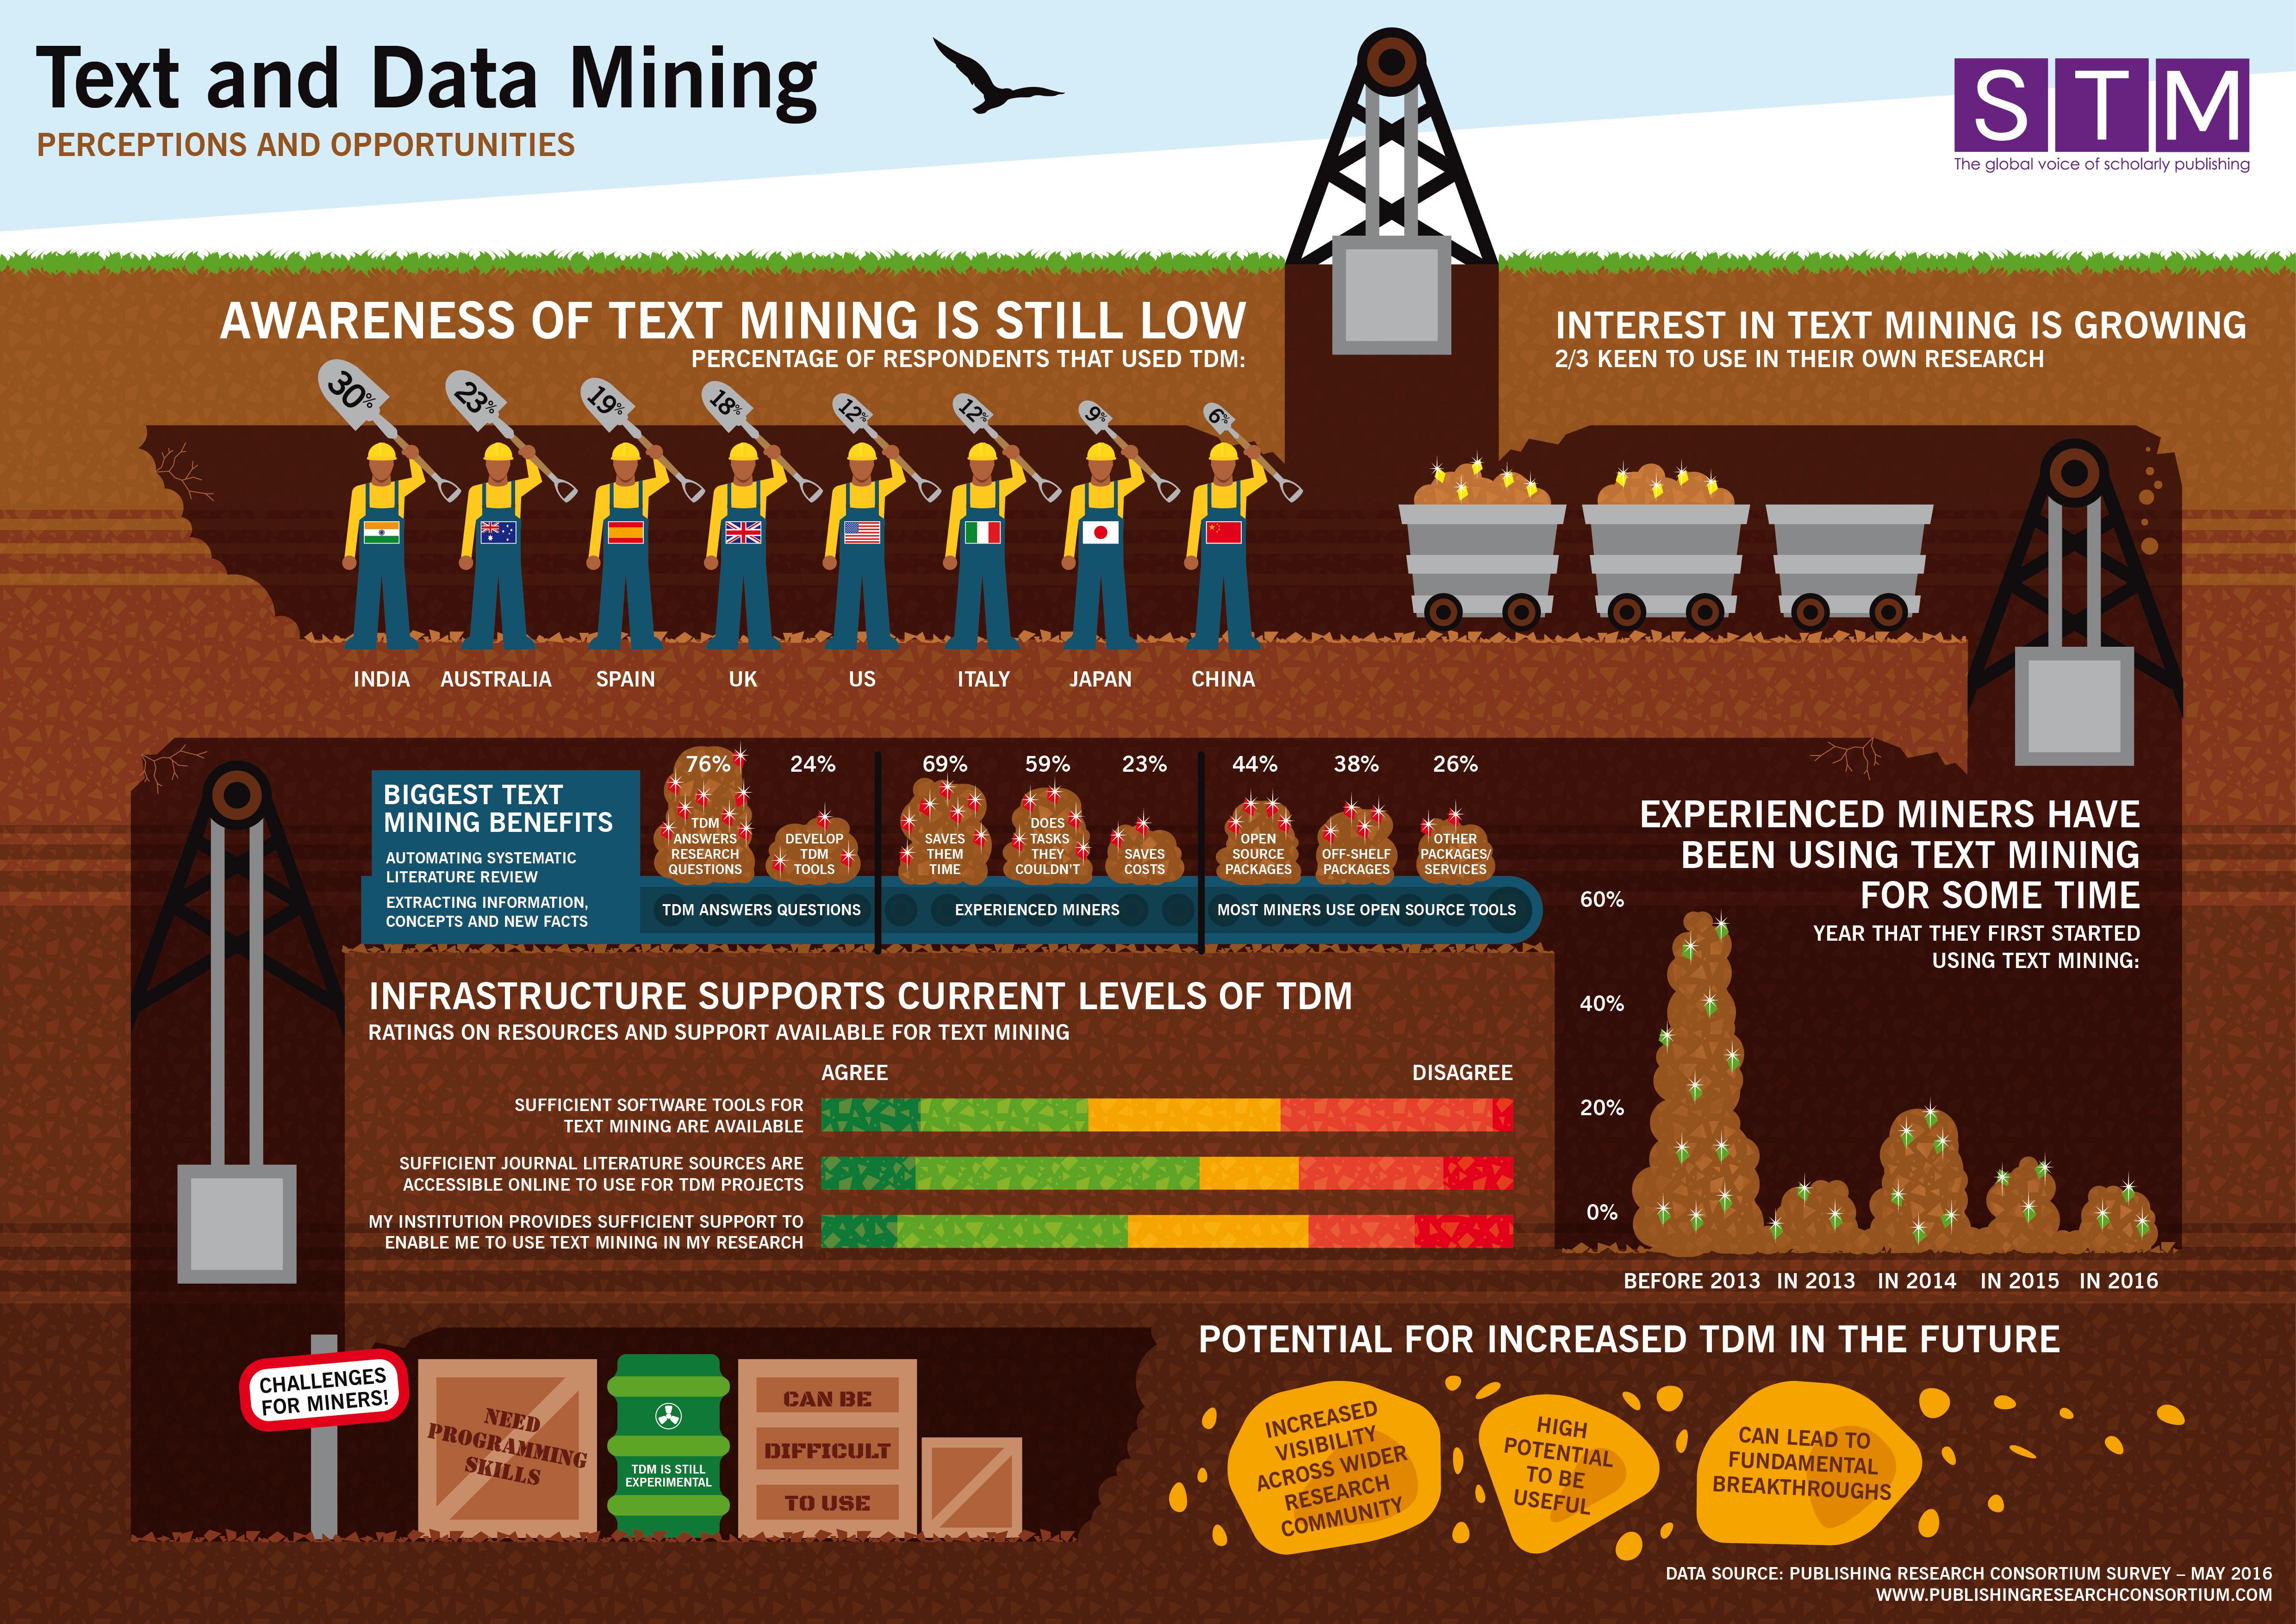 STM TDM Infographic A3 V2-01